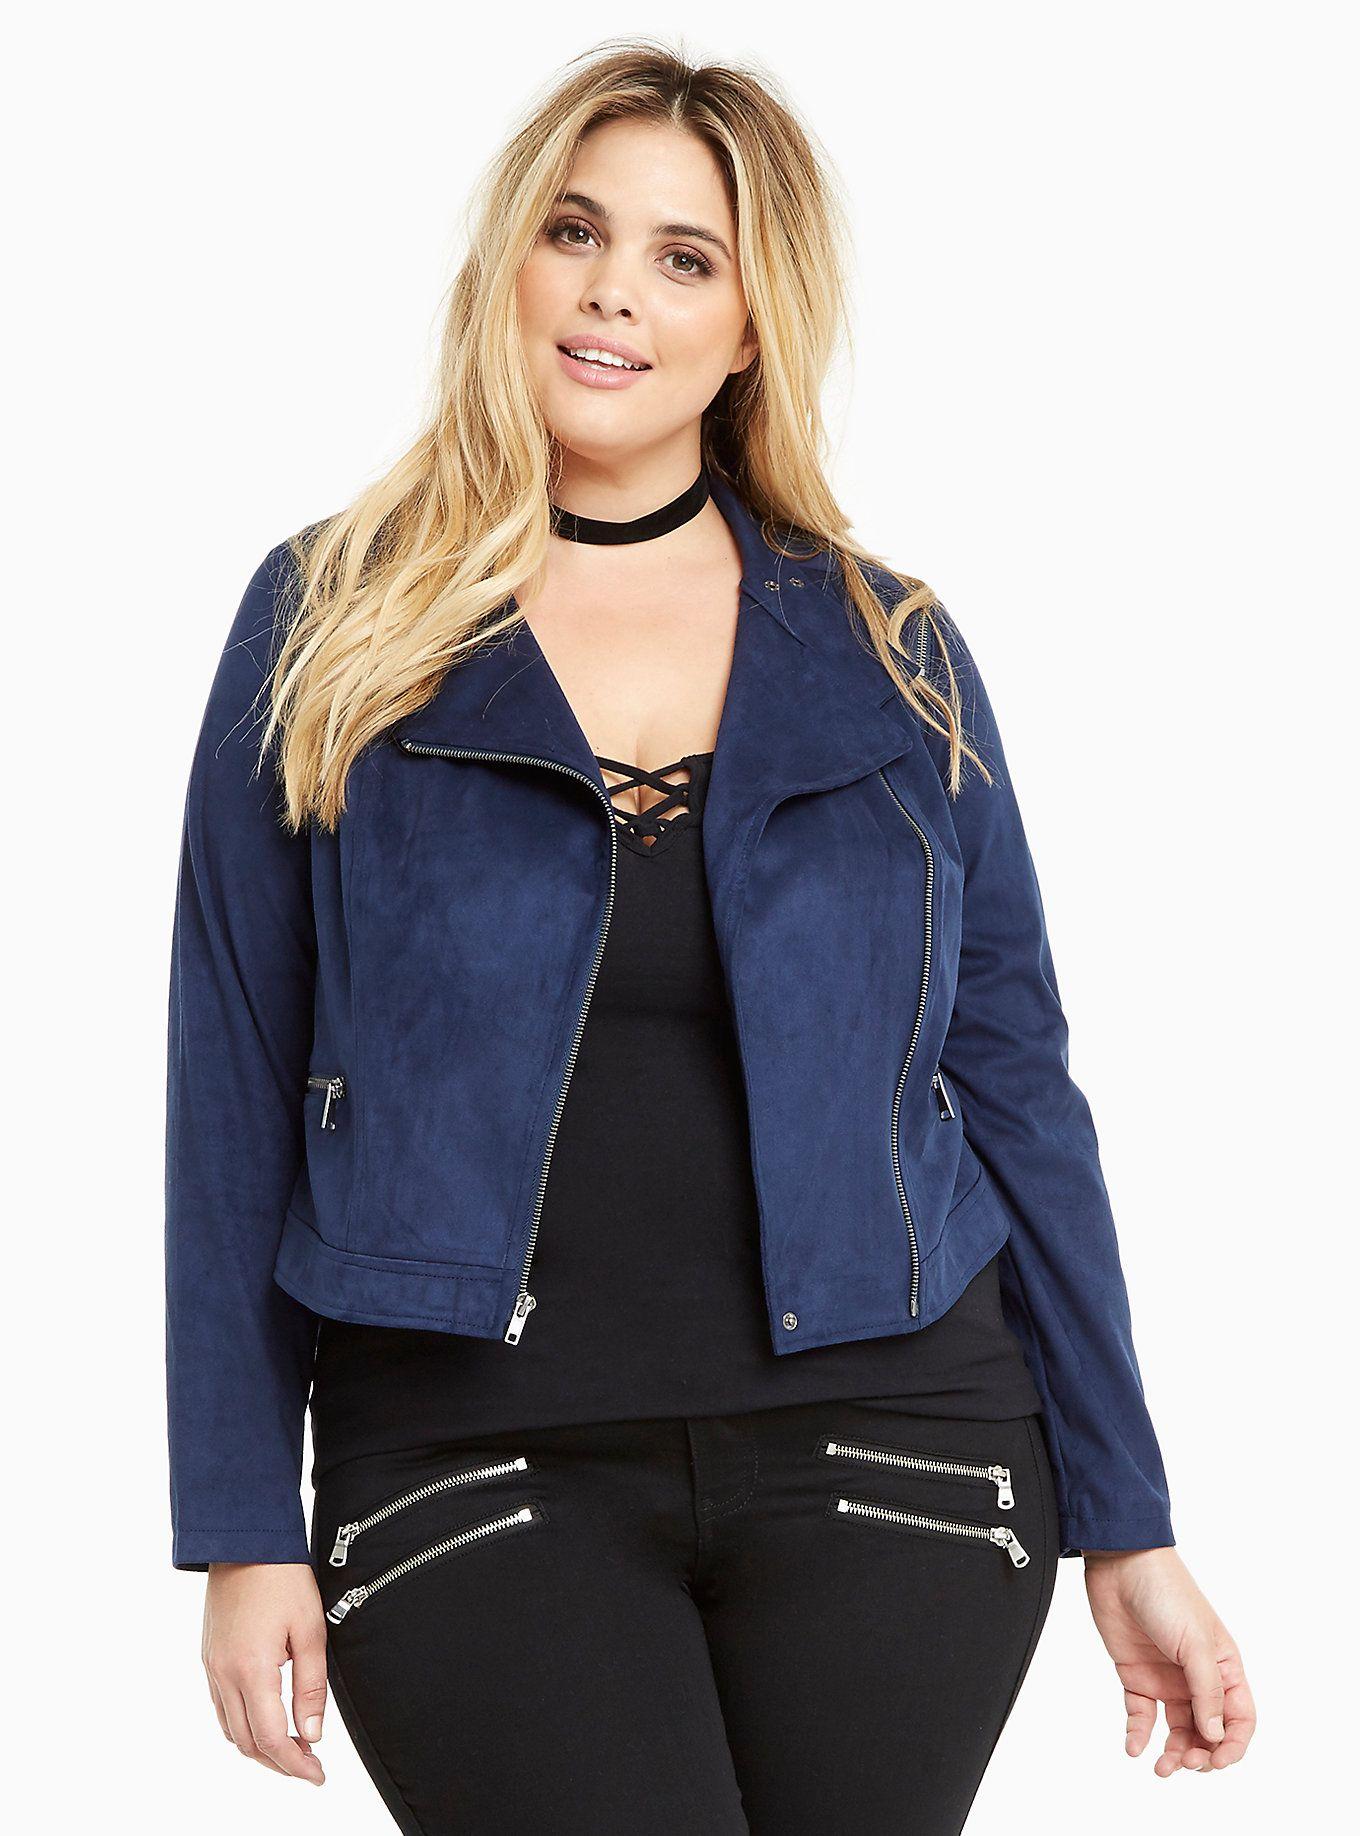 Faux Suede Zip Moto Jacket Moto jacket, Jackets, Suede